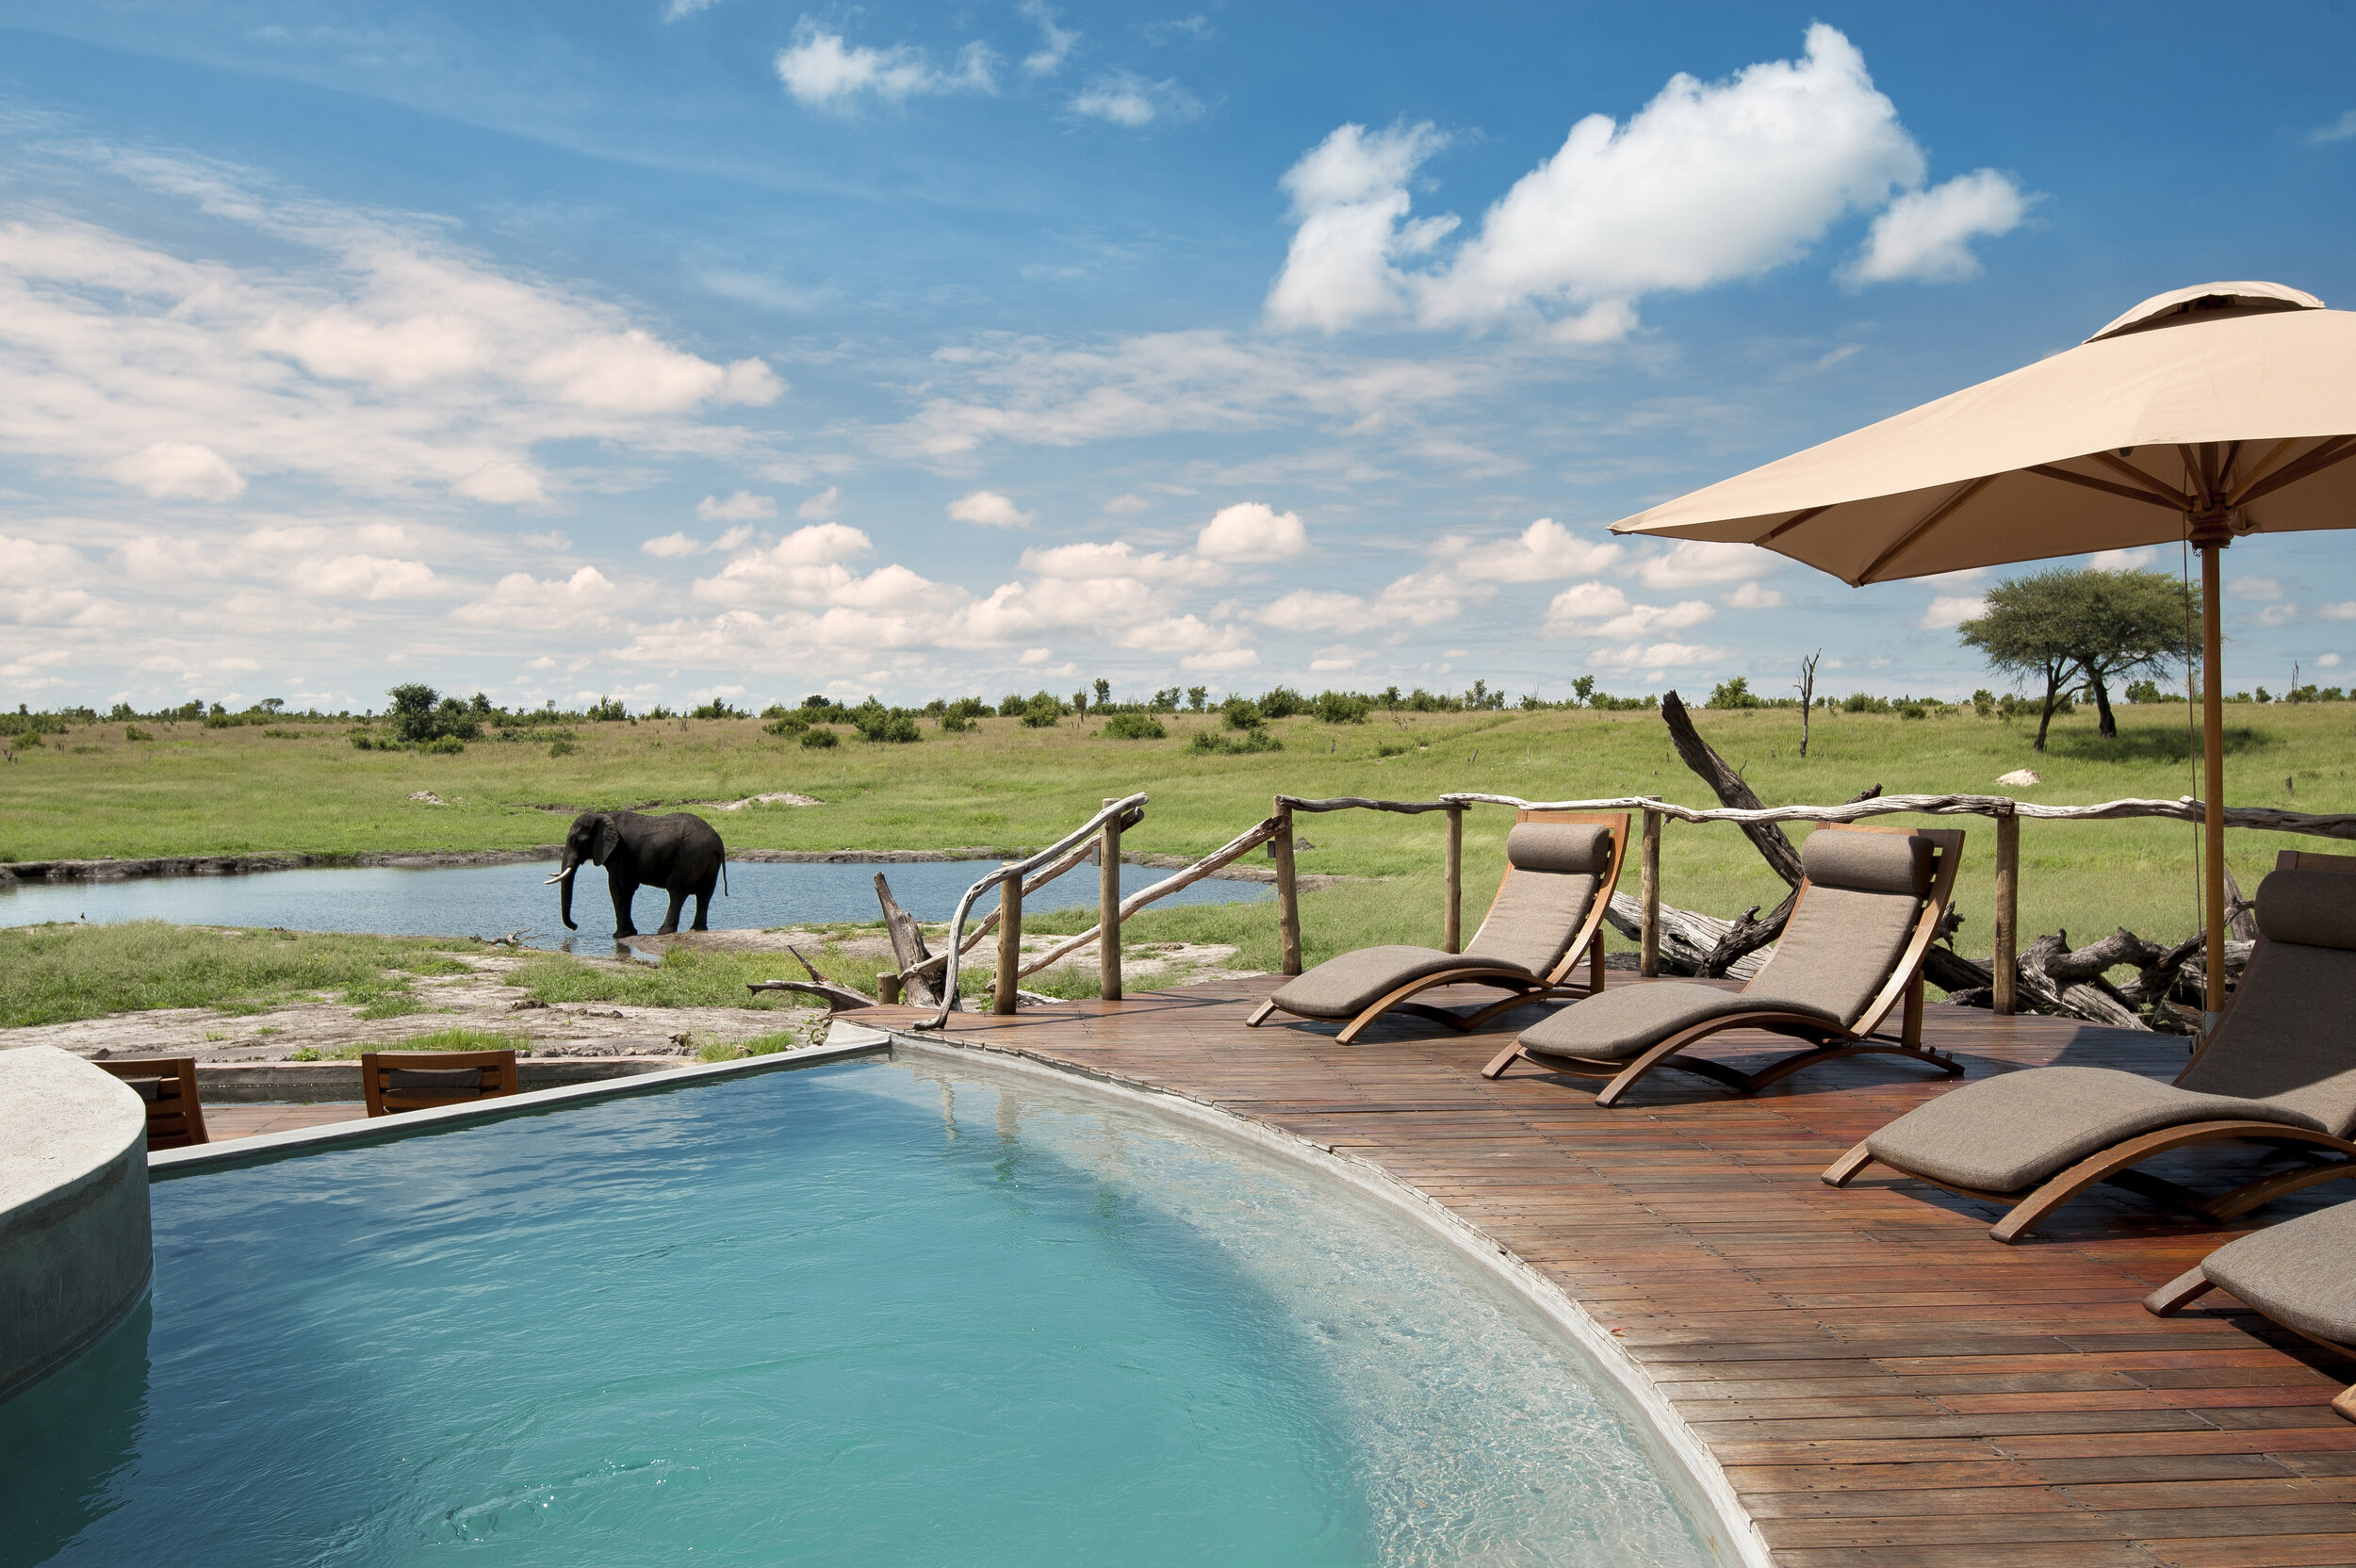 somalisa_camp_hwange_national_park_zimbabwe_luxury_safari_lodge_african_bush_camps_pool_area_5.jpg